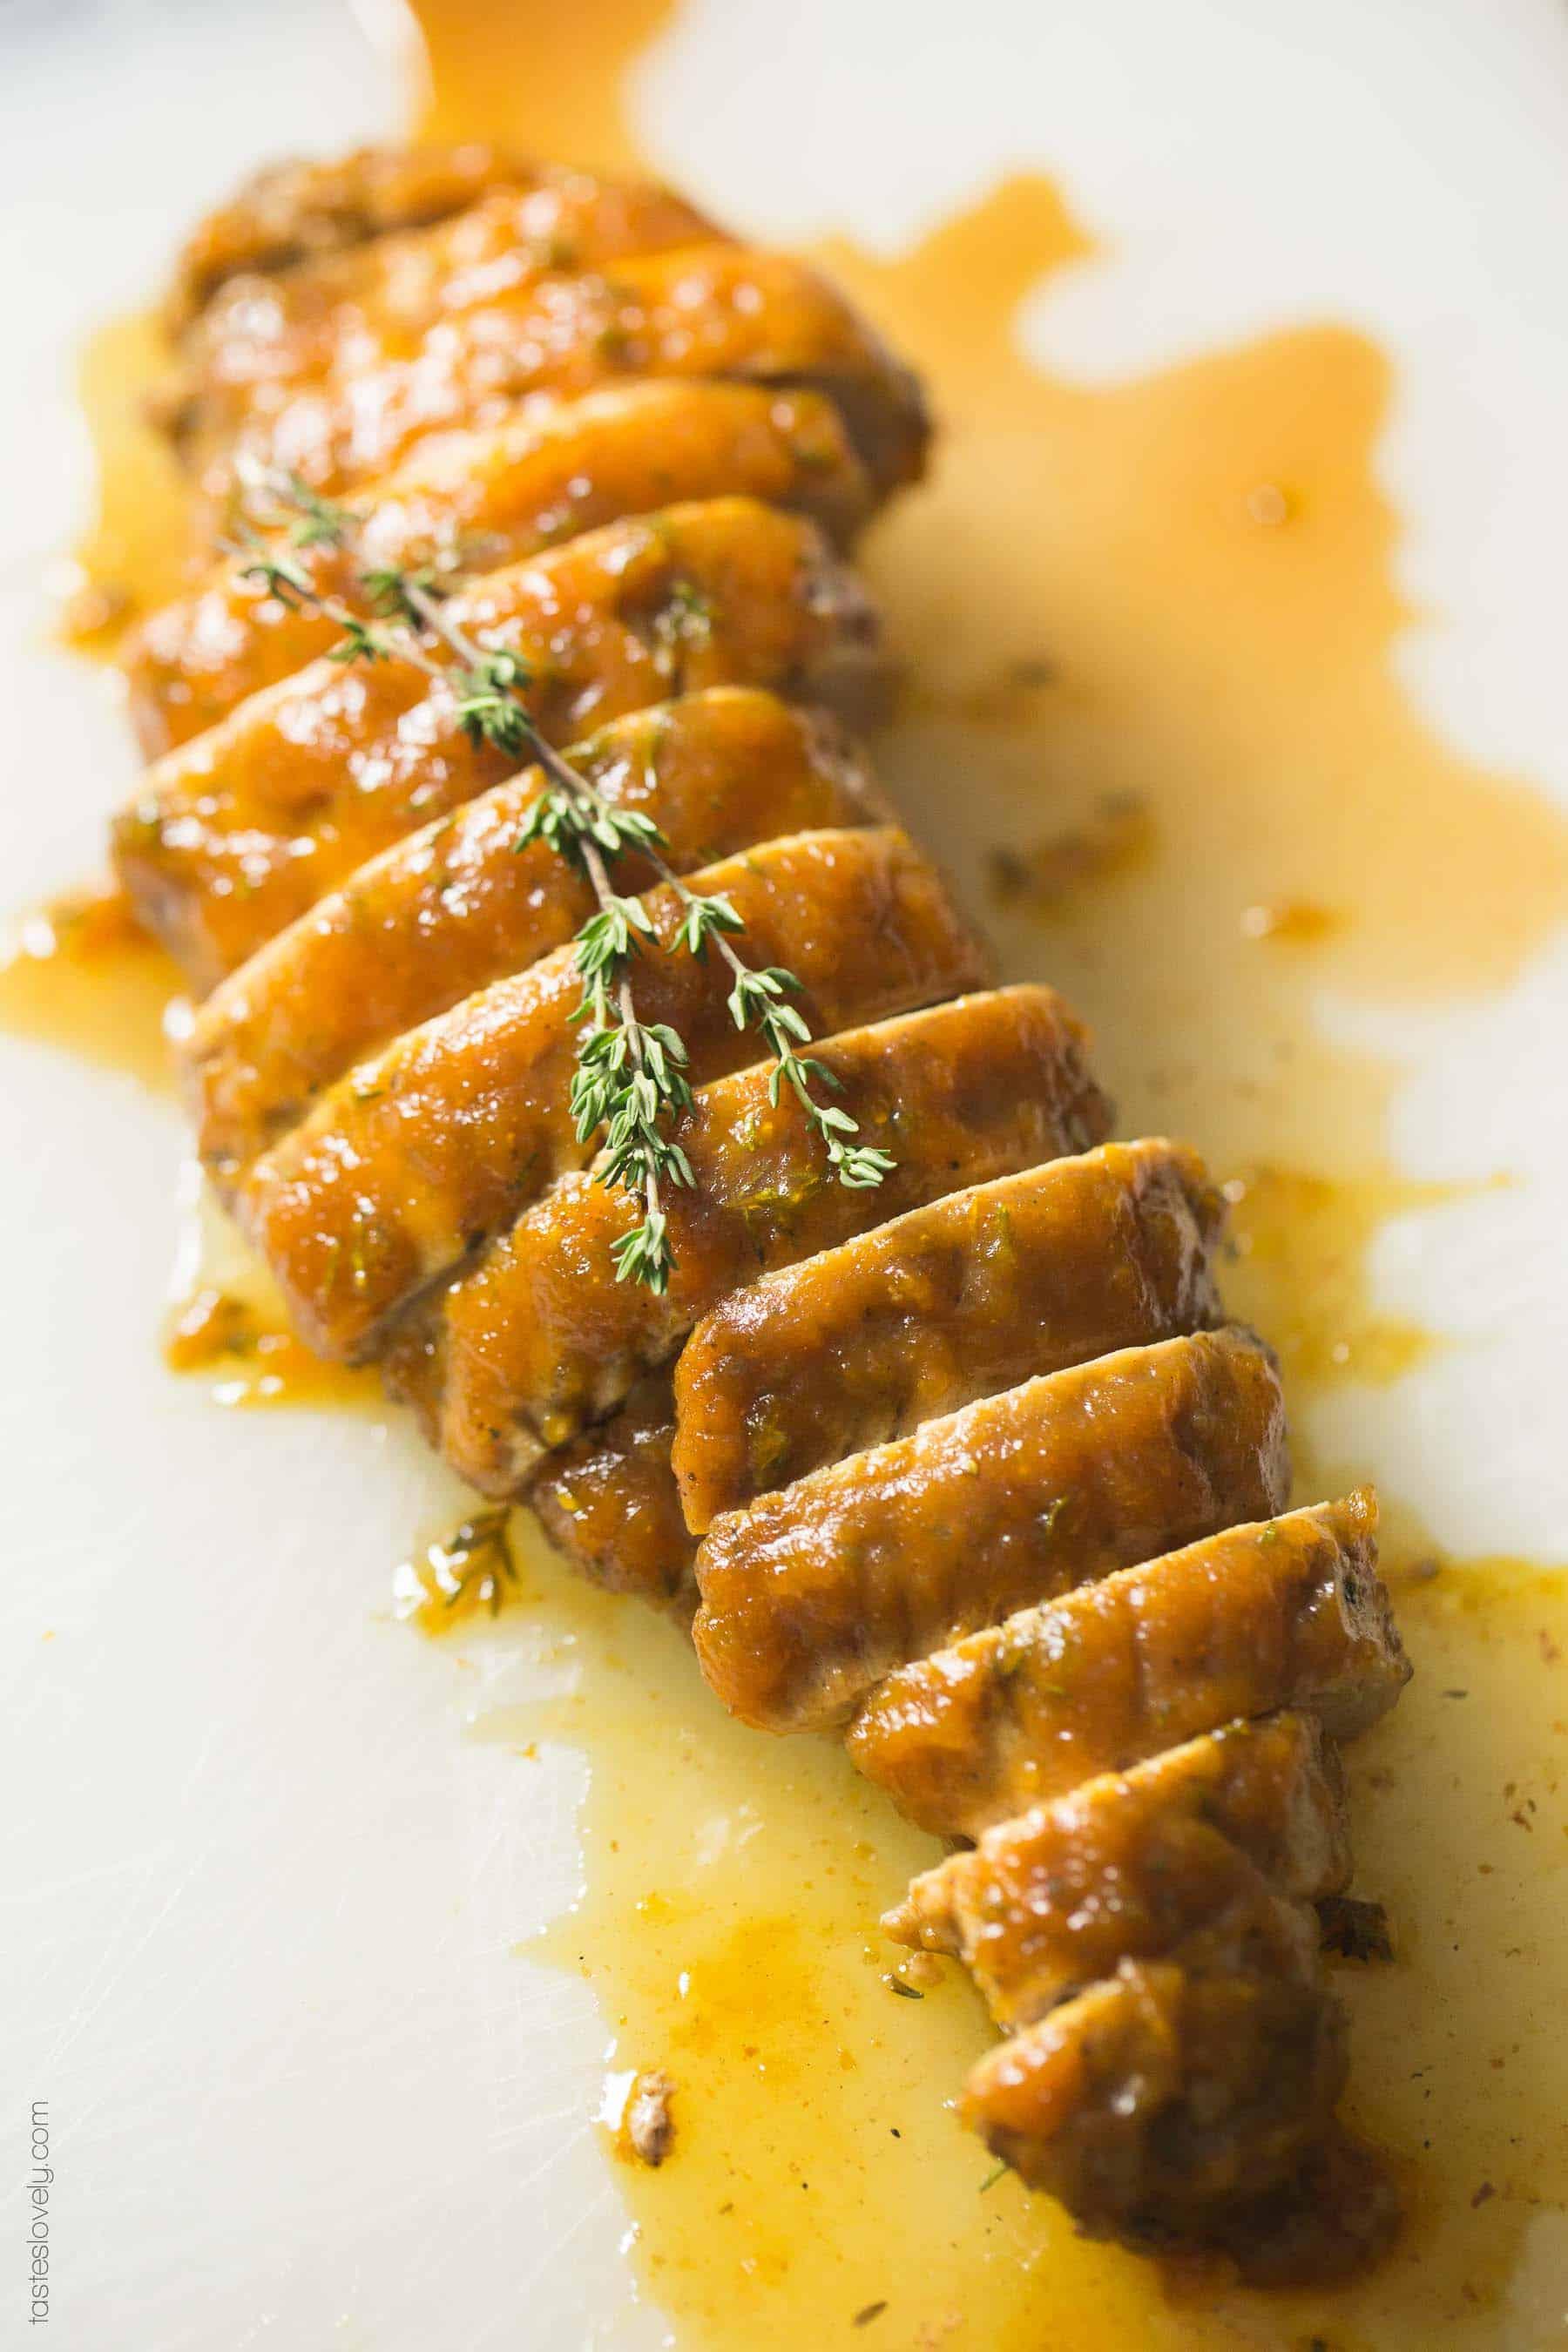 Pumpkin Butter & Thyme Pork Tenderloin - a paleo, gluten free, dairy free, refined sugar free dinner recipe